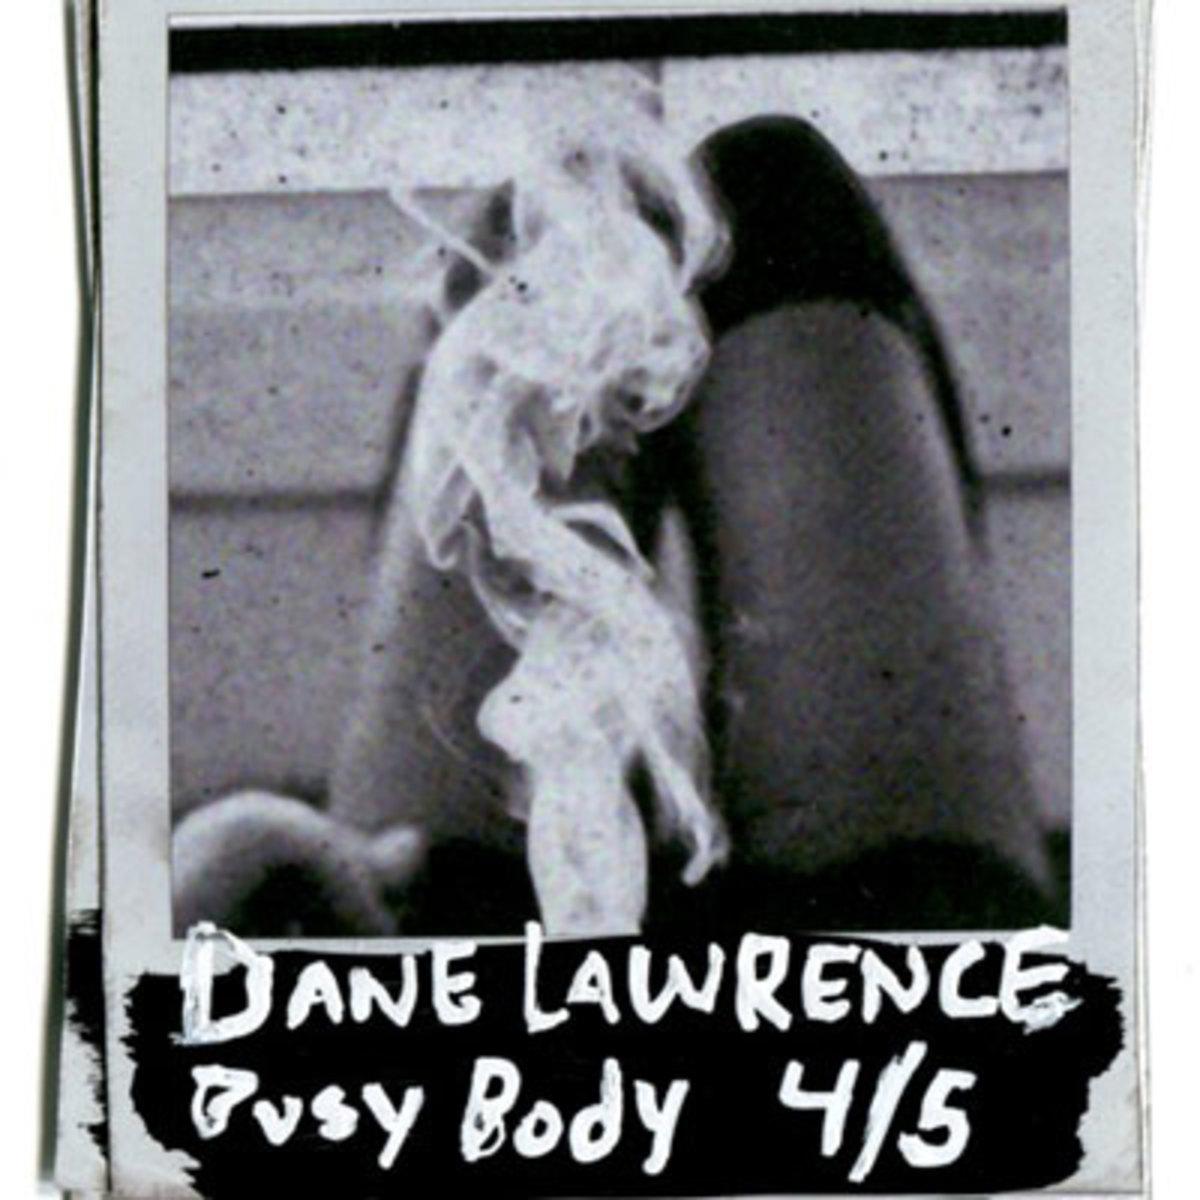 danelawrence-busybody.jpg